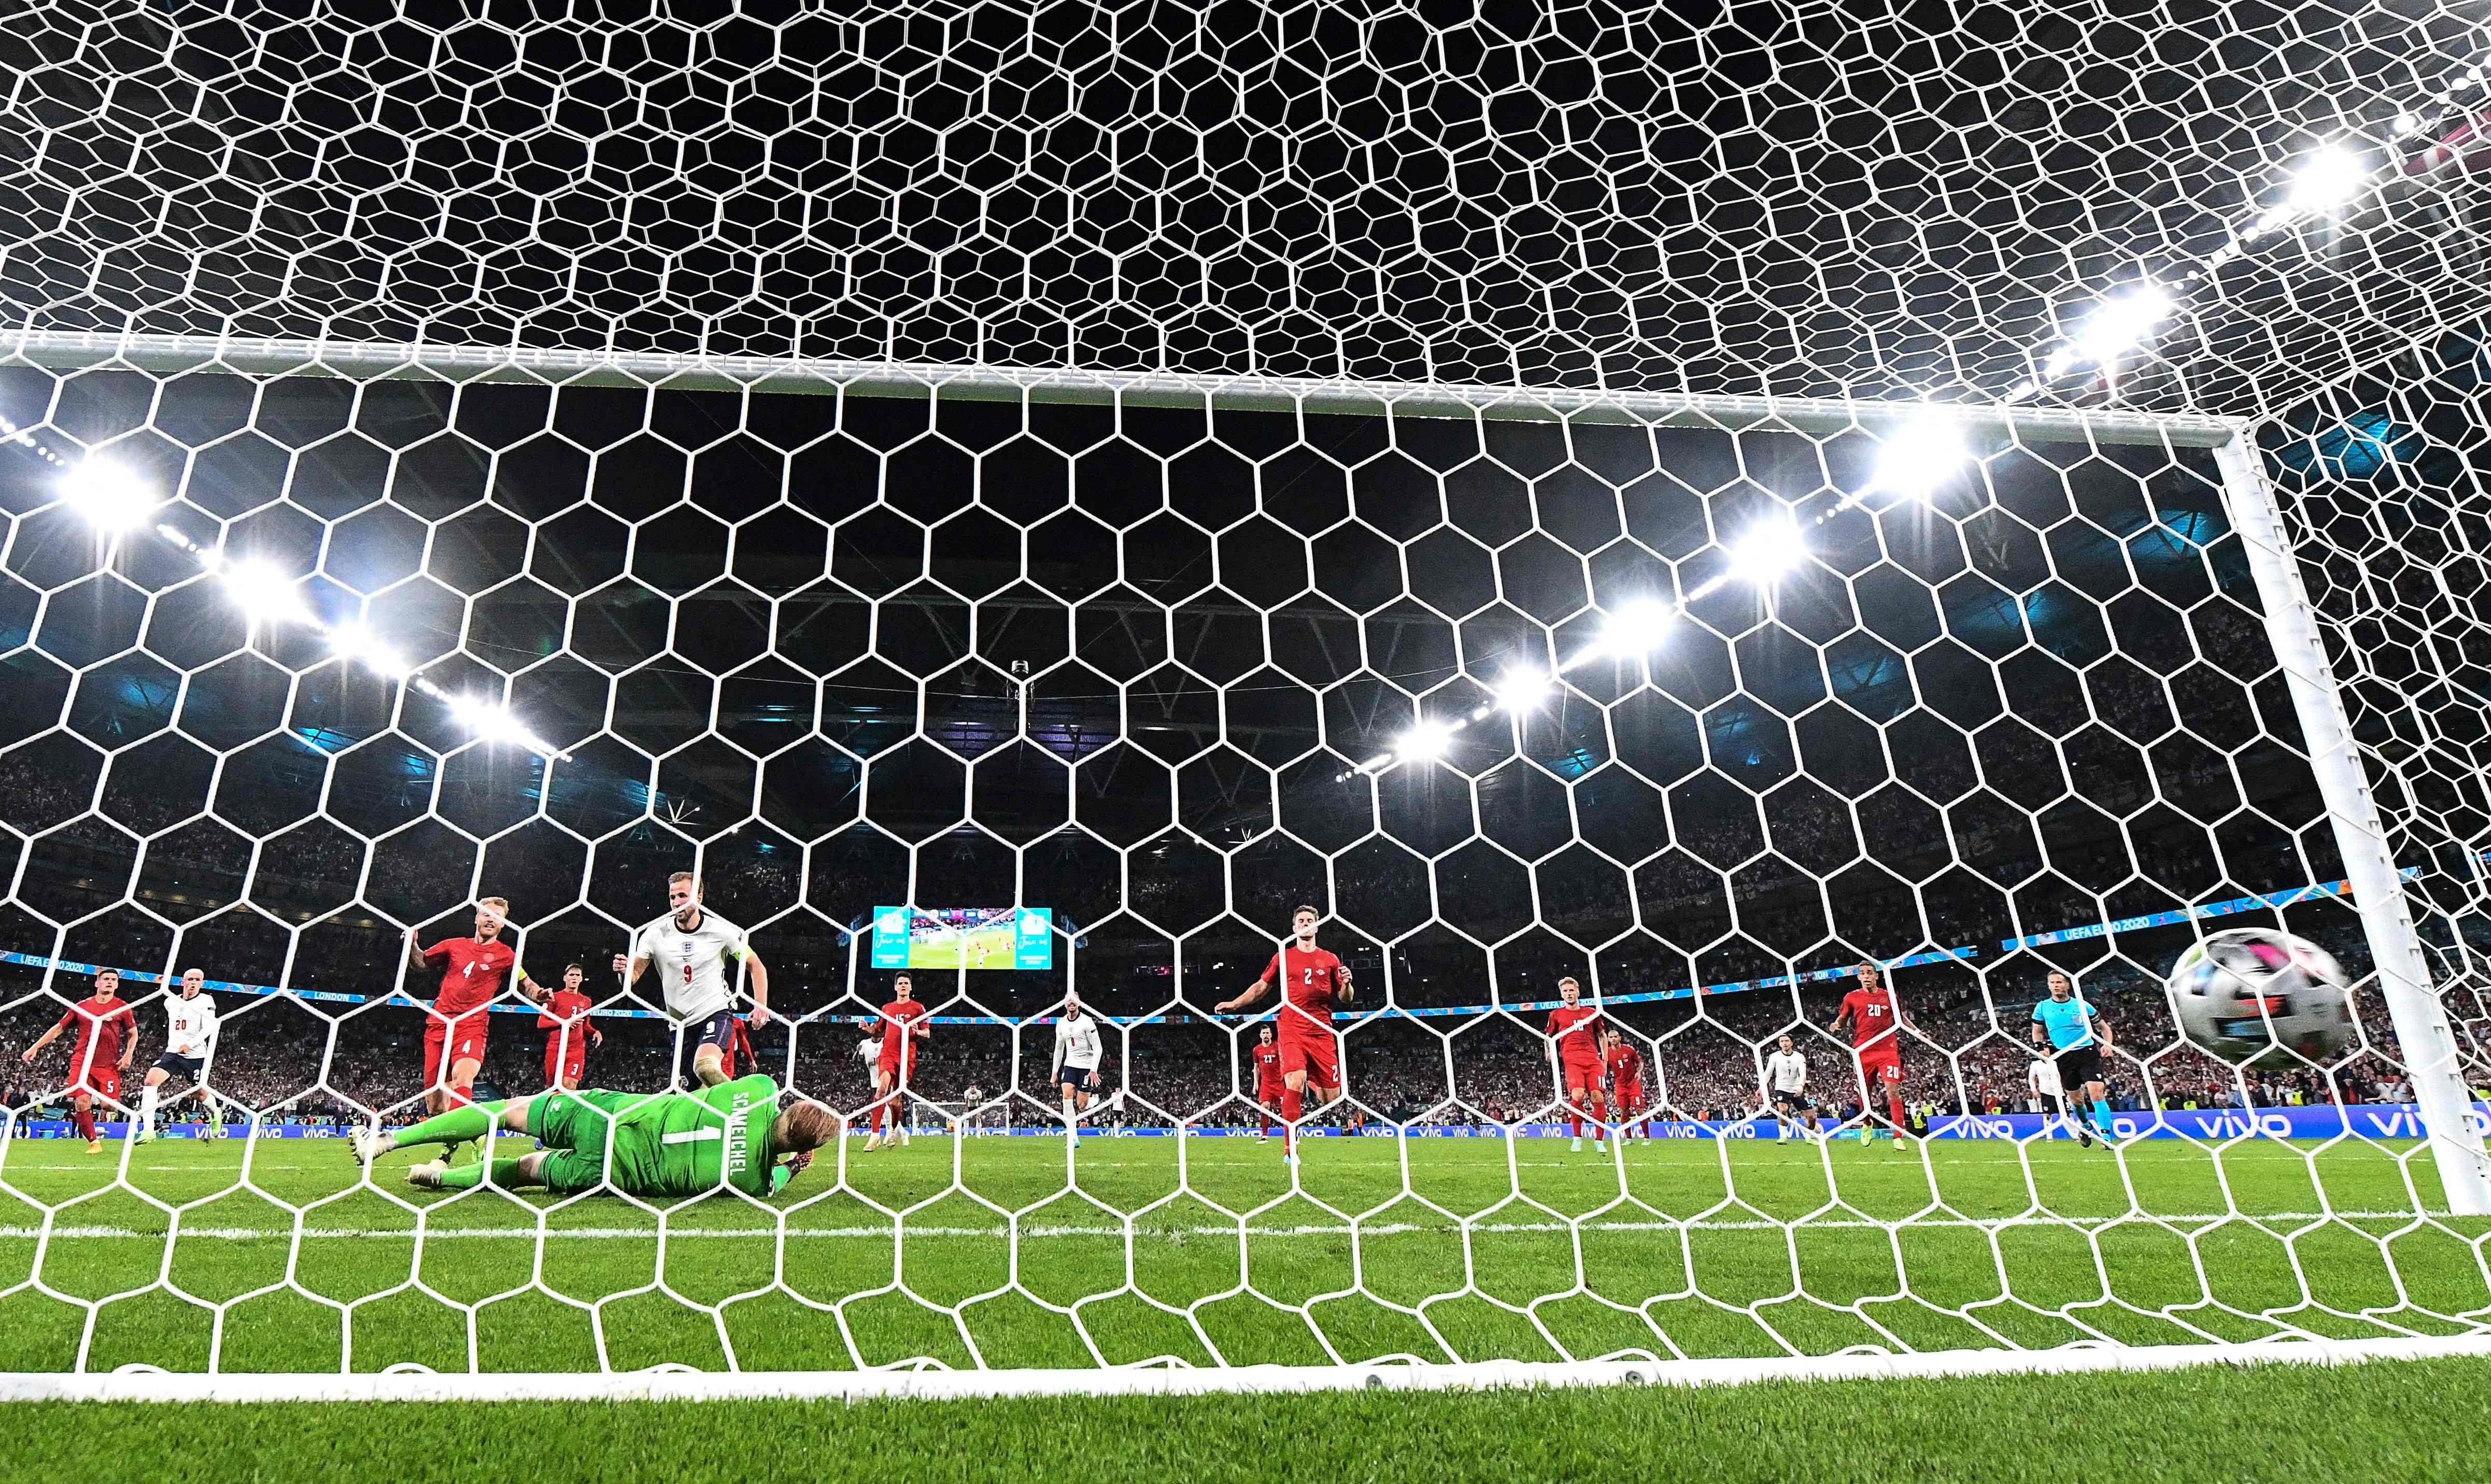 Gol por pênalti suspeito põe Inglaterra na final